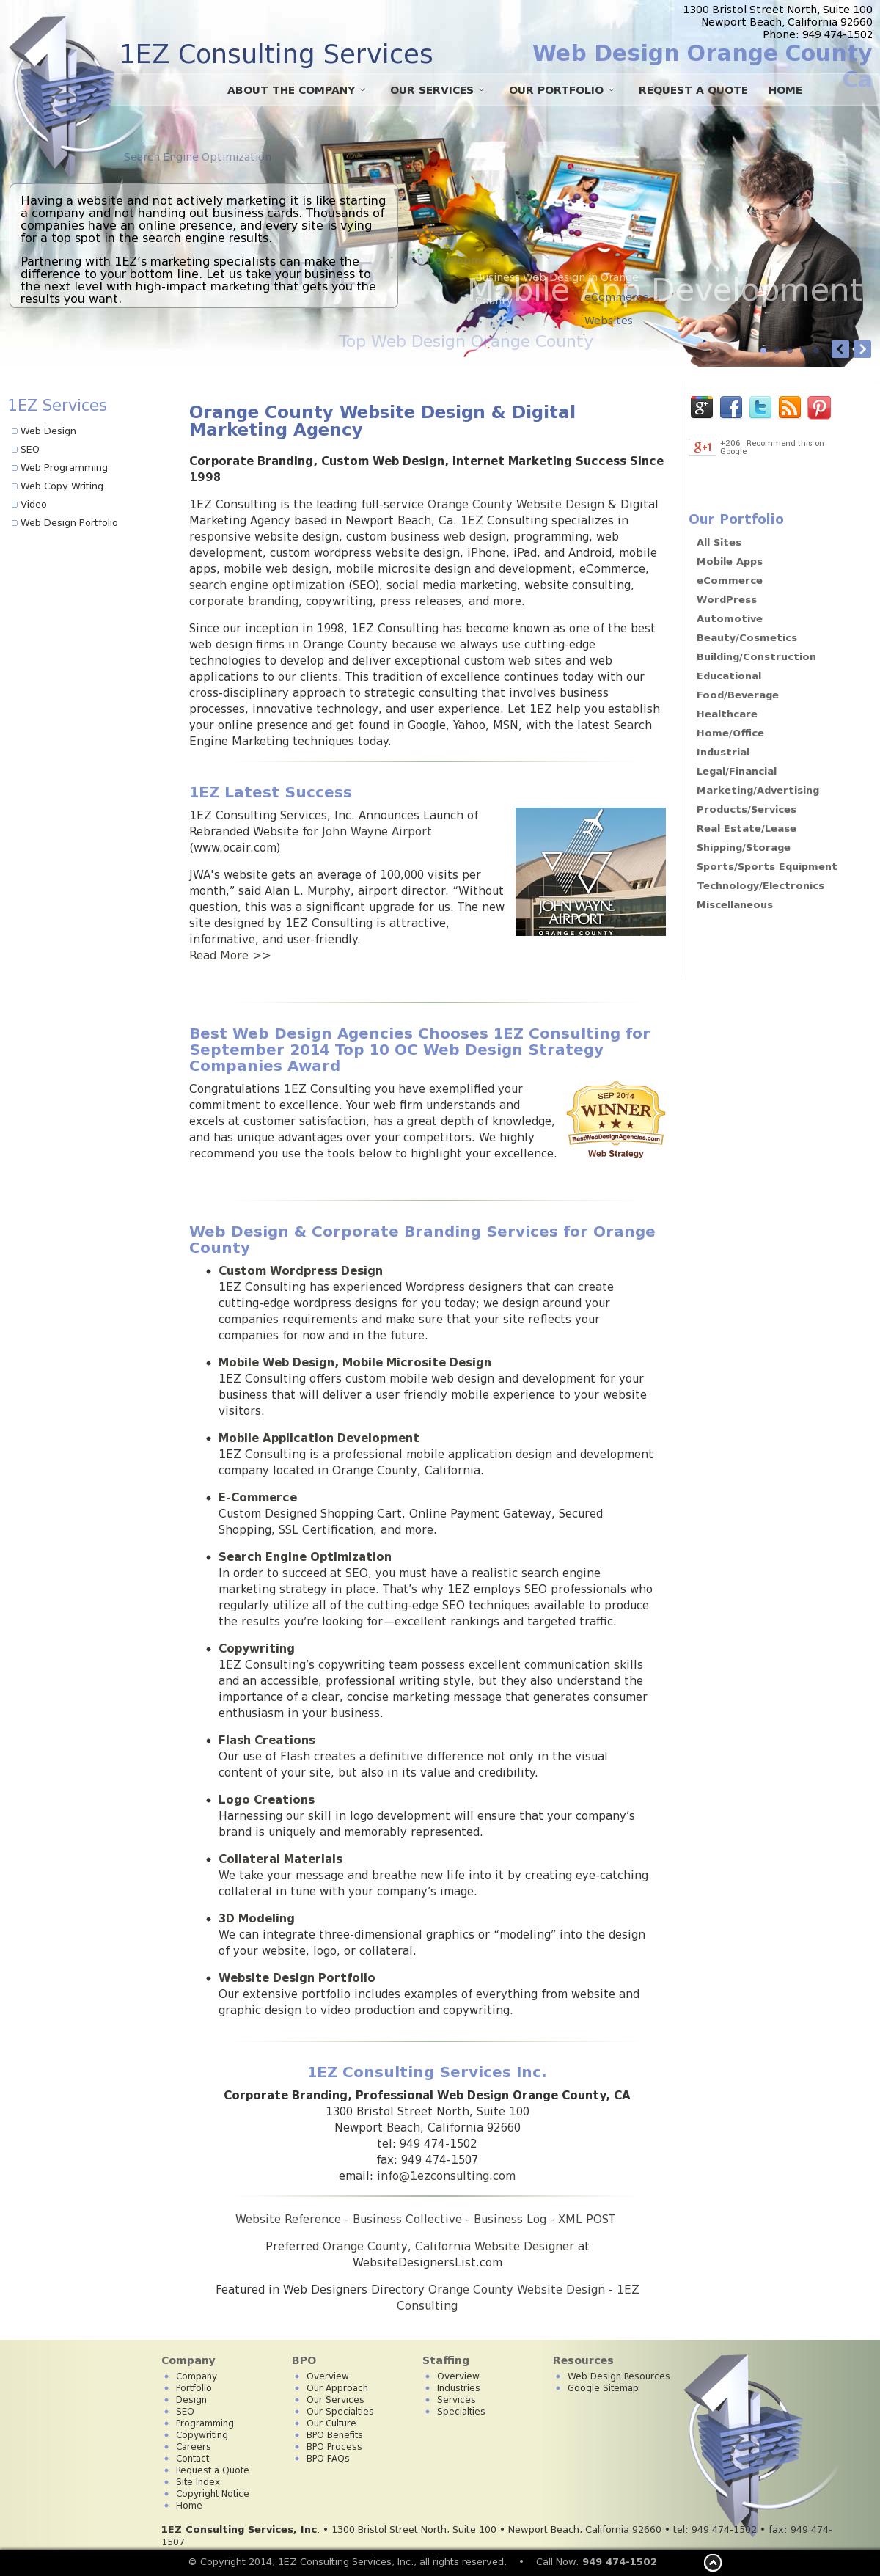 1EZ Creative Competitors, Revenue and Employees - Owler